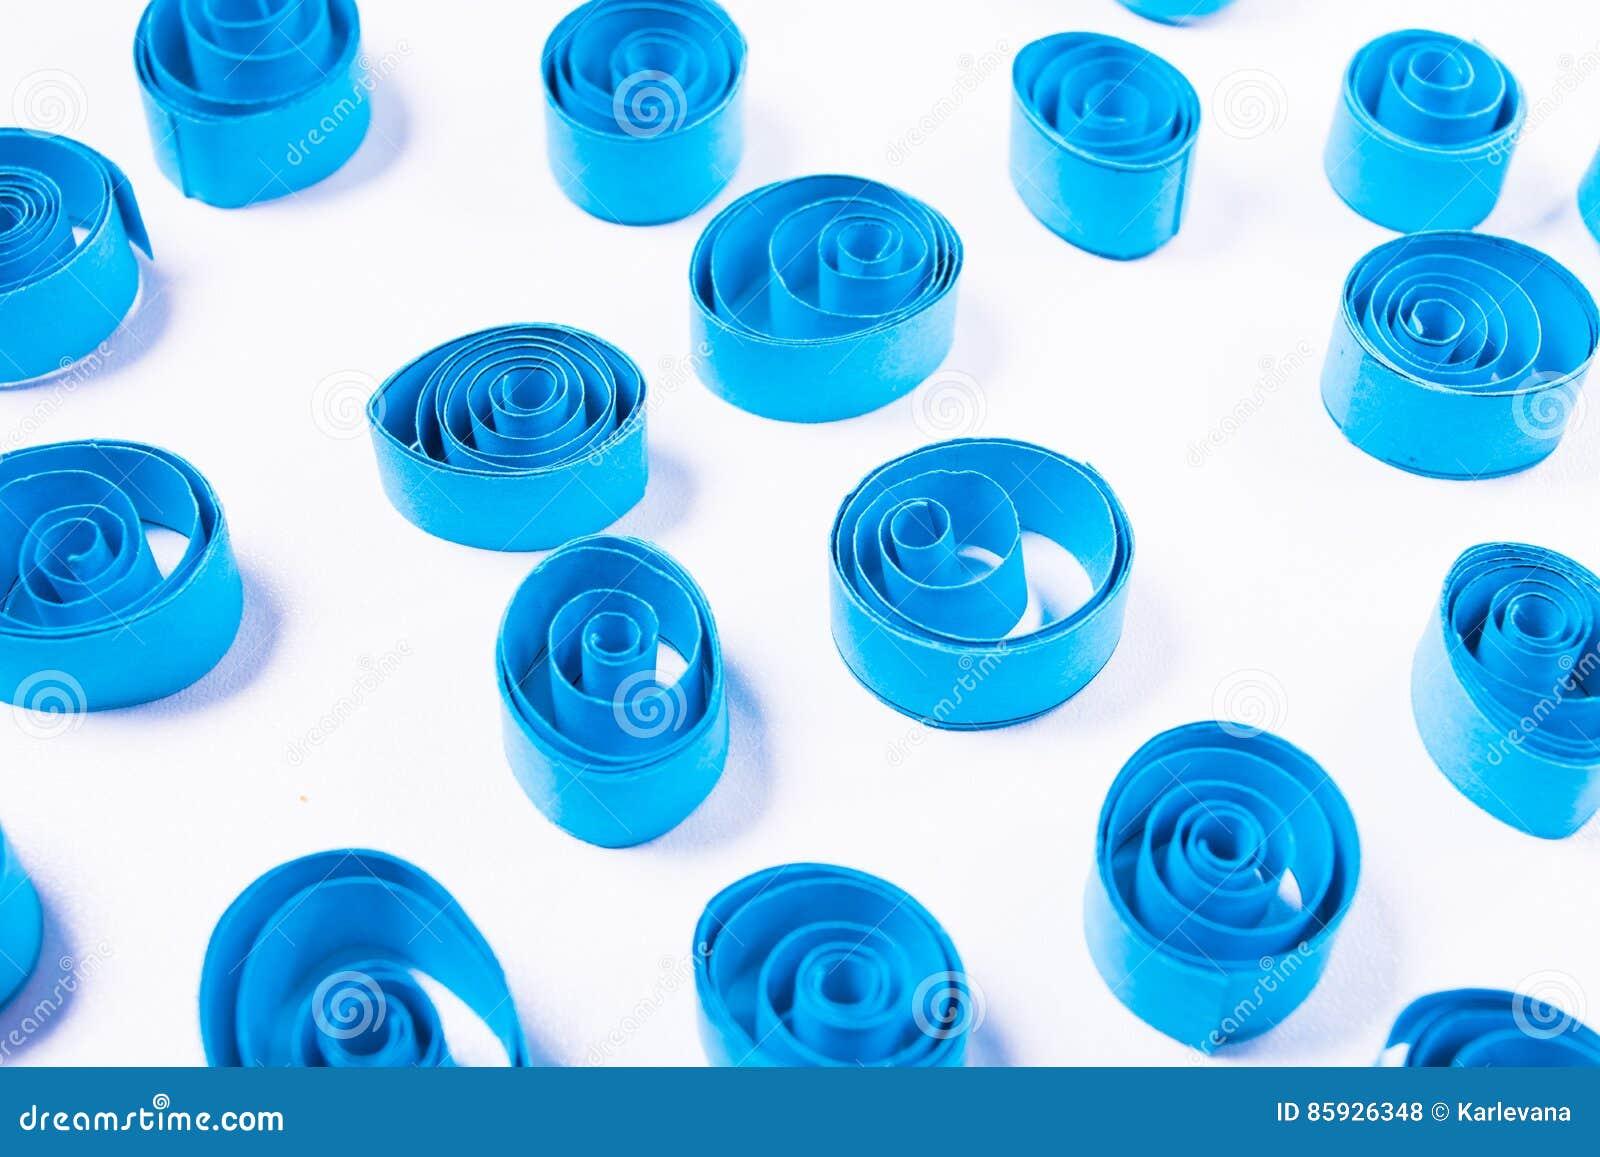 Quilling art. Blue paper curls